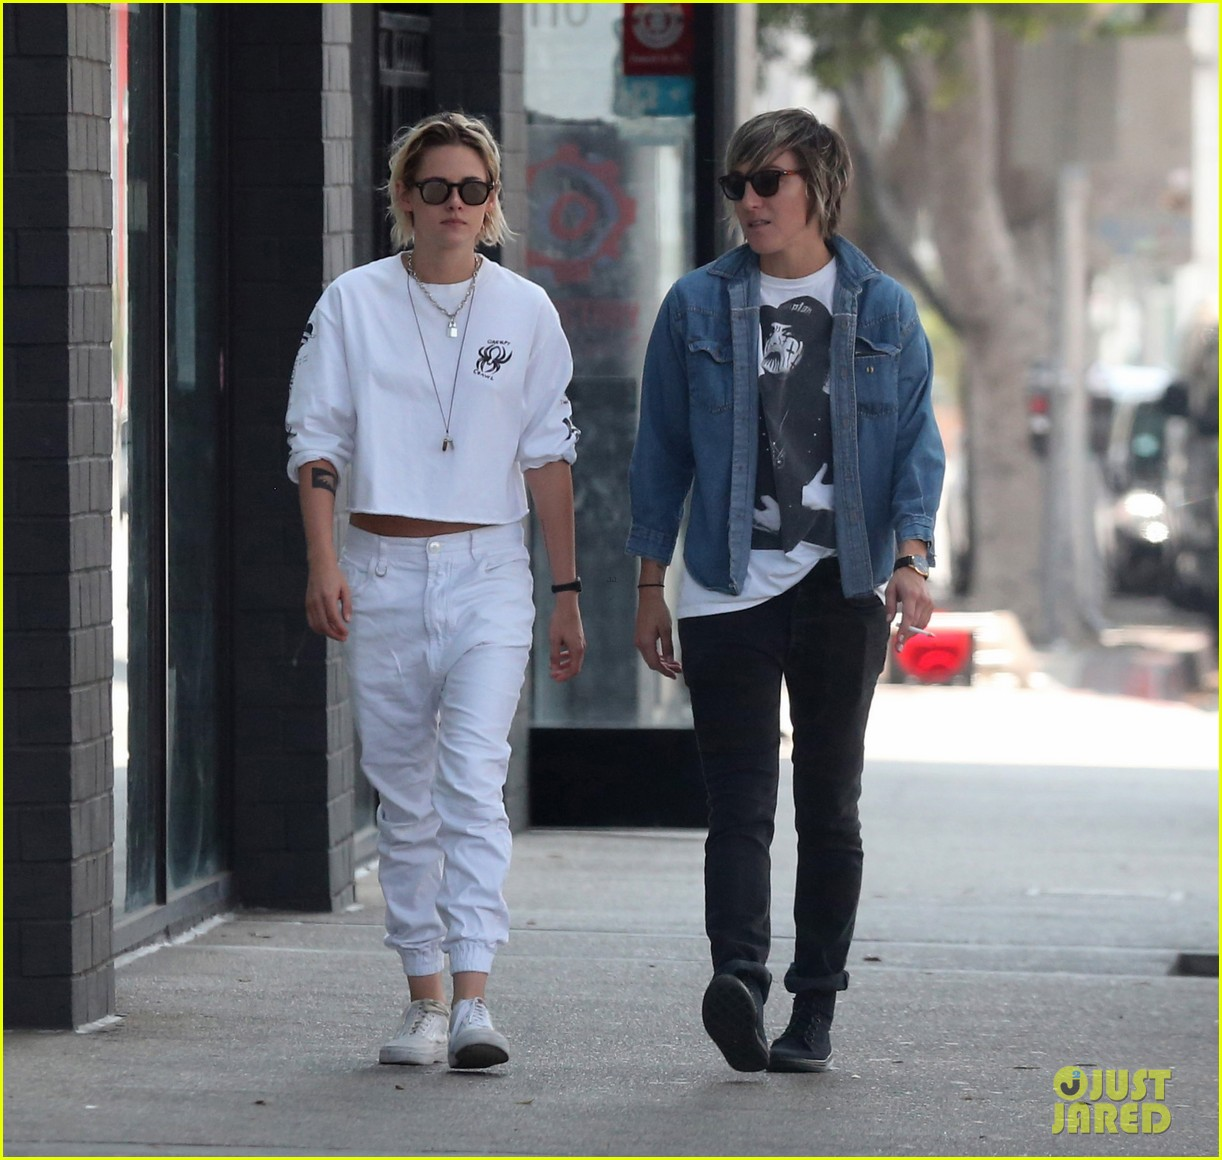 Kristen Stewart & Alicia Cargile Take Their Dog Shopping ...